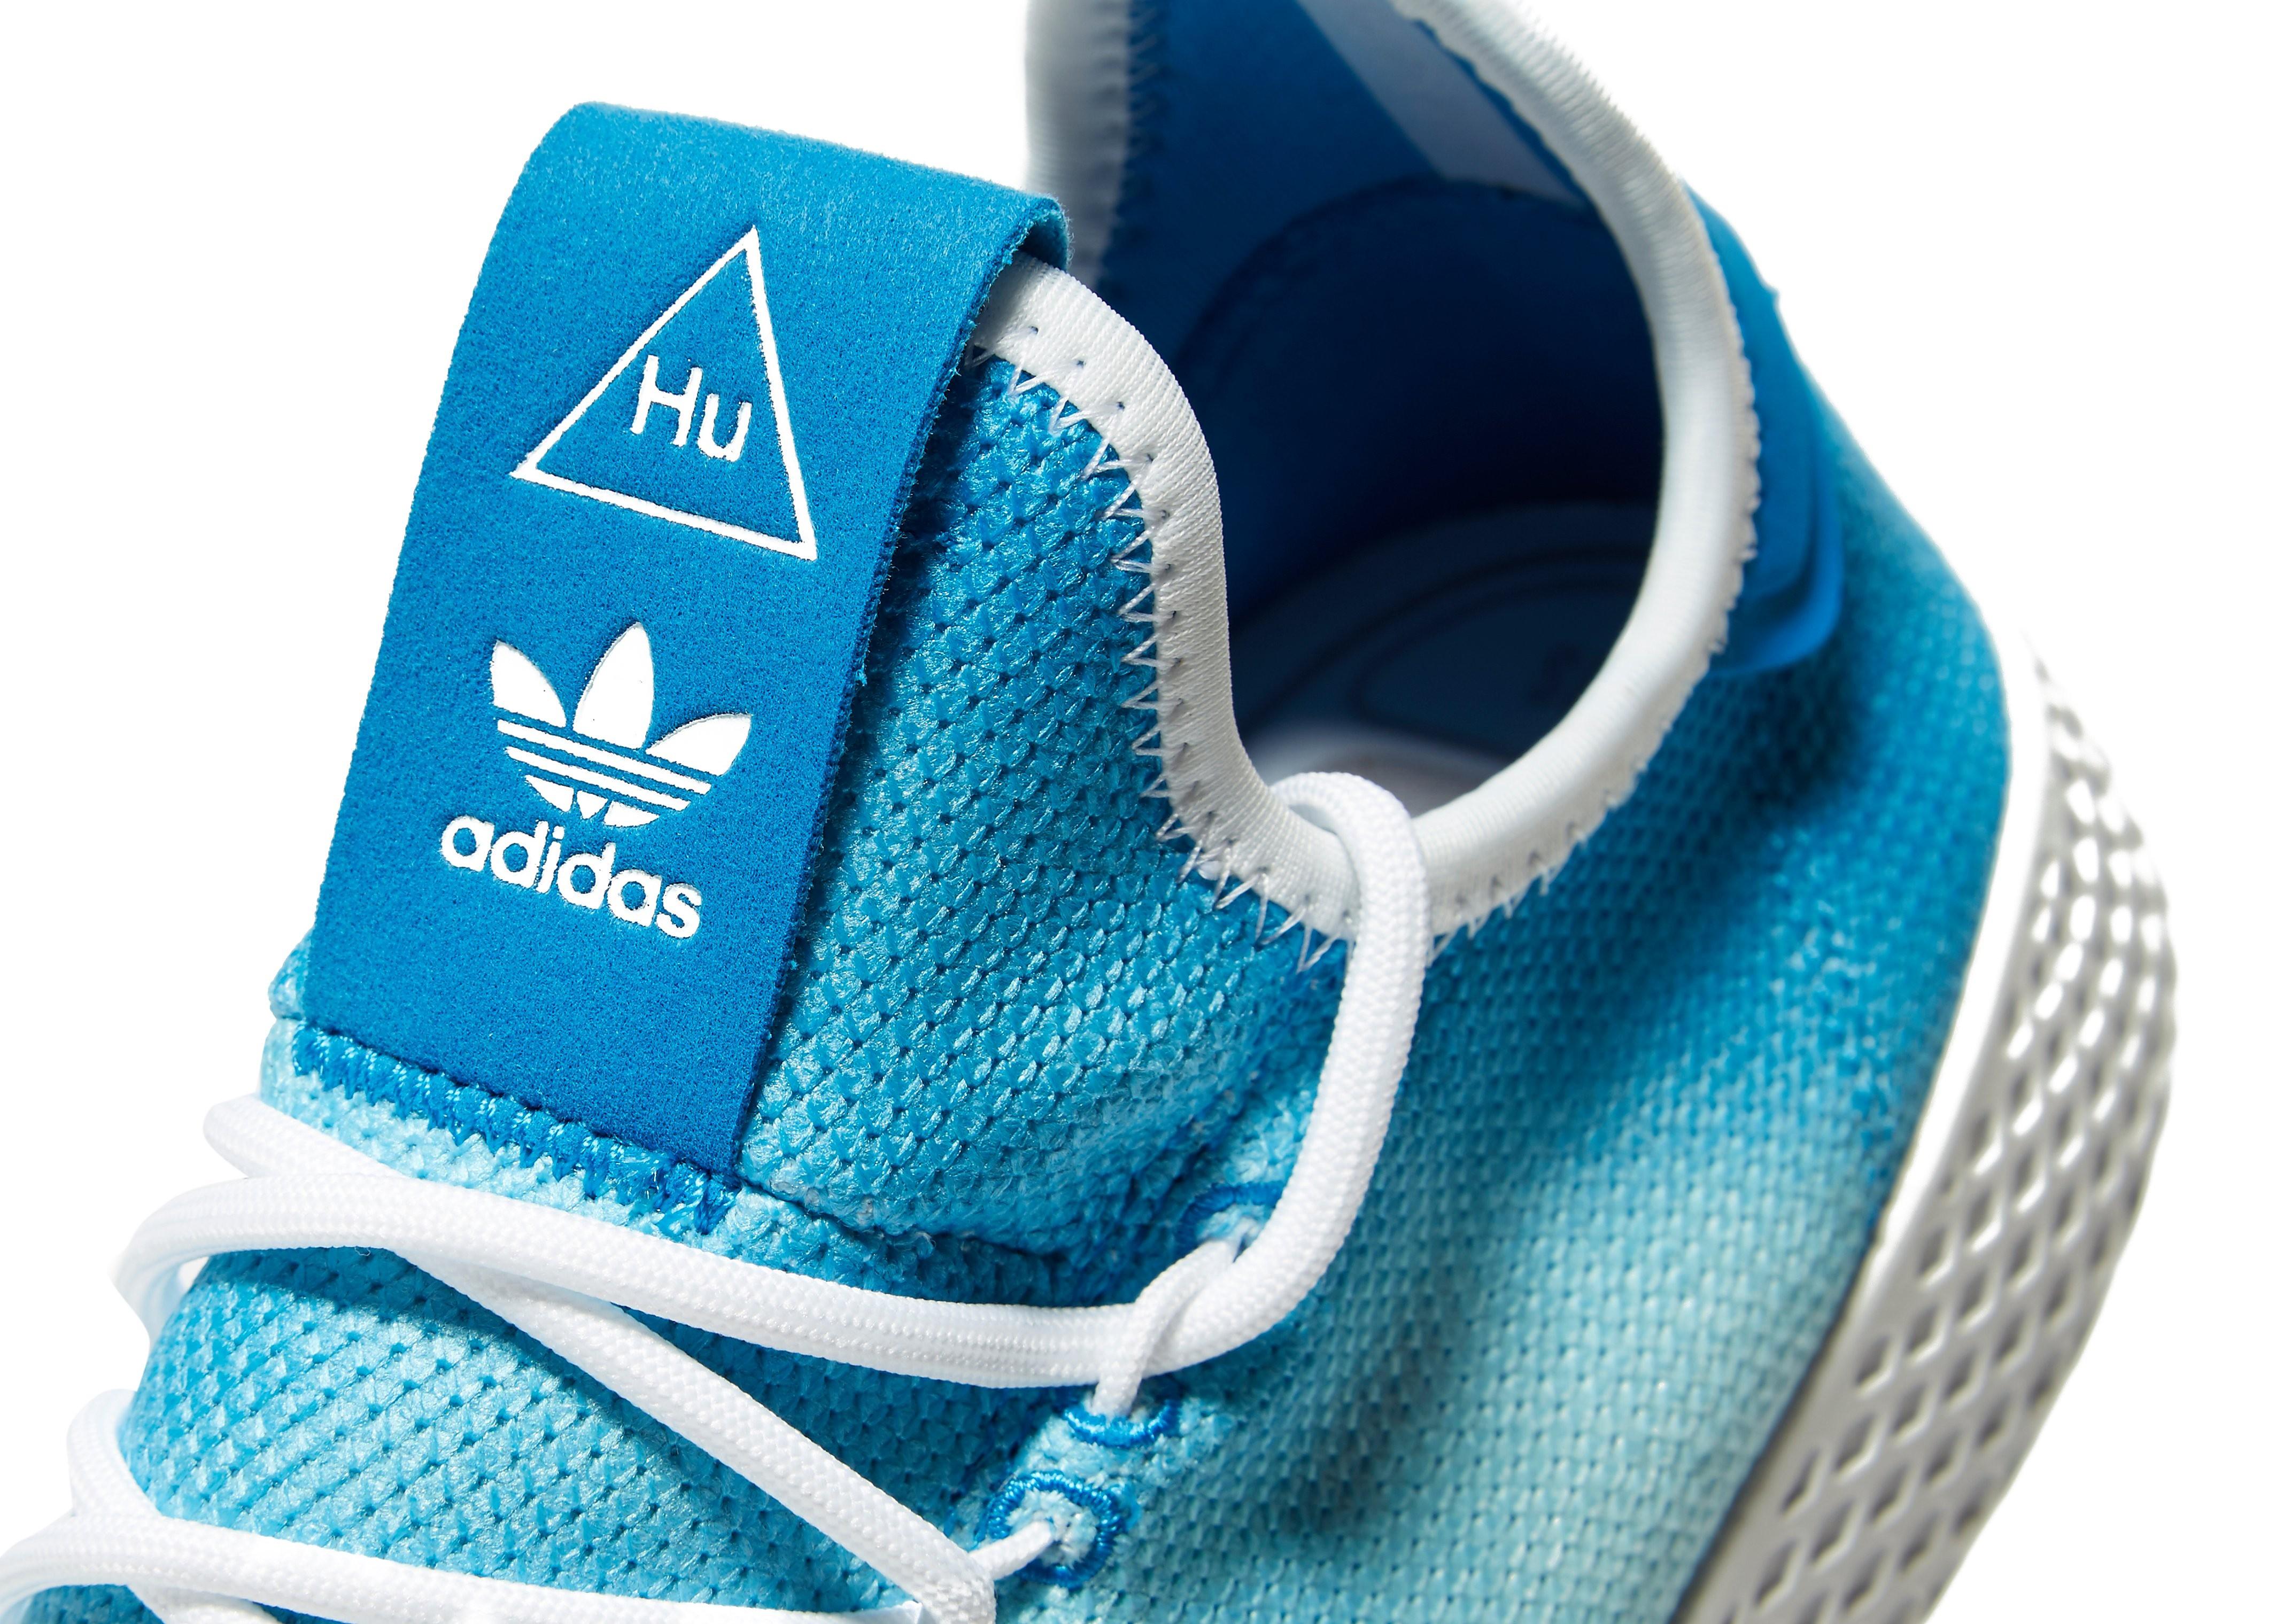 adidas Originals x Pharrell Williams Holi Tennis Hu